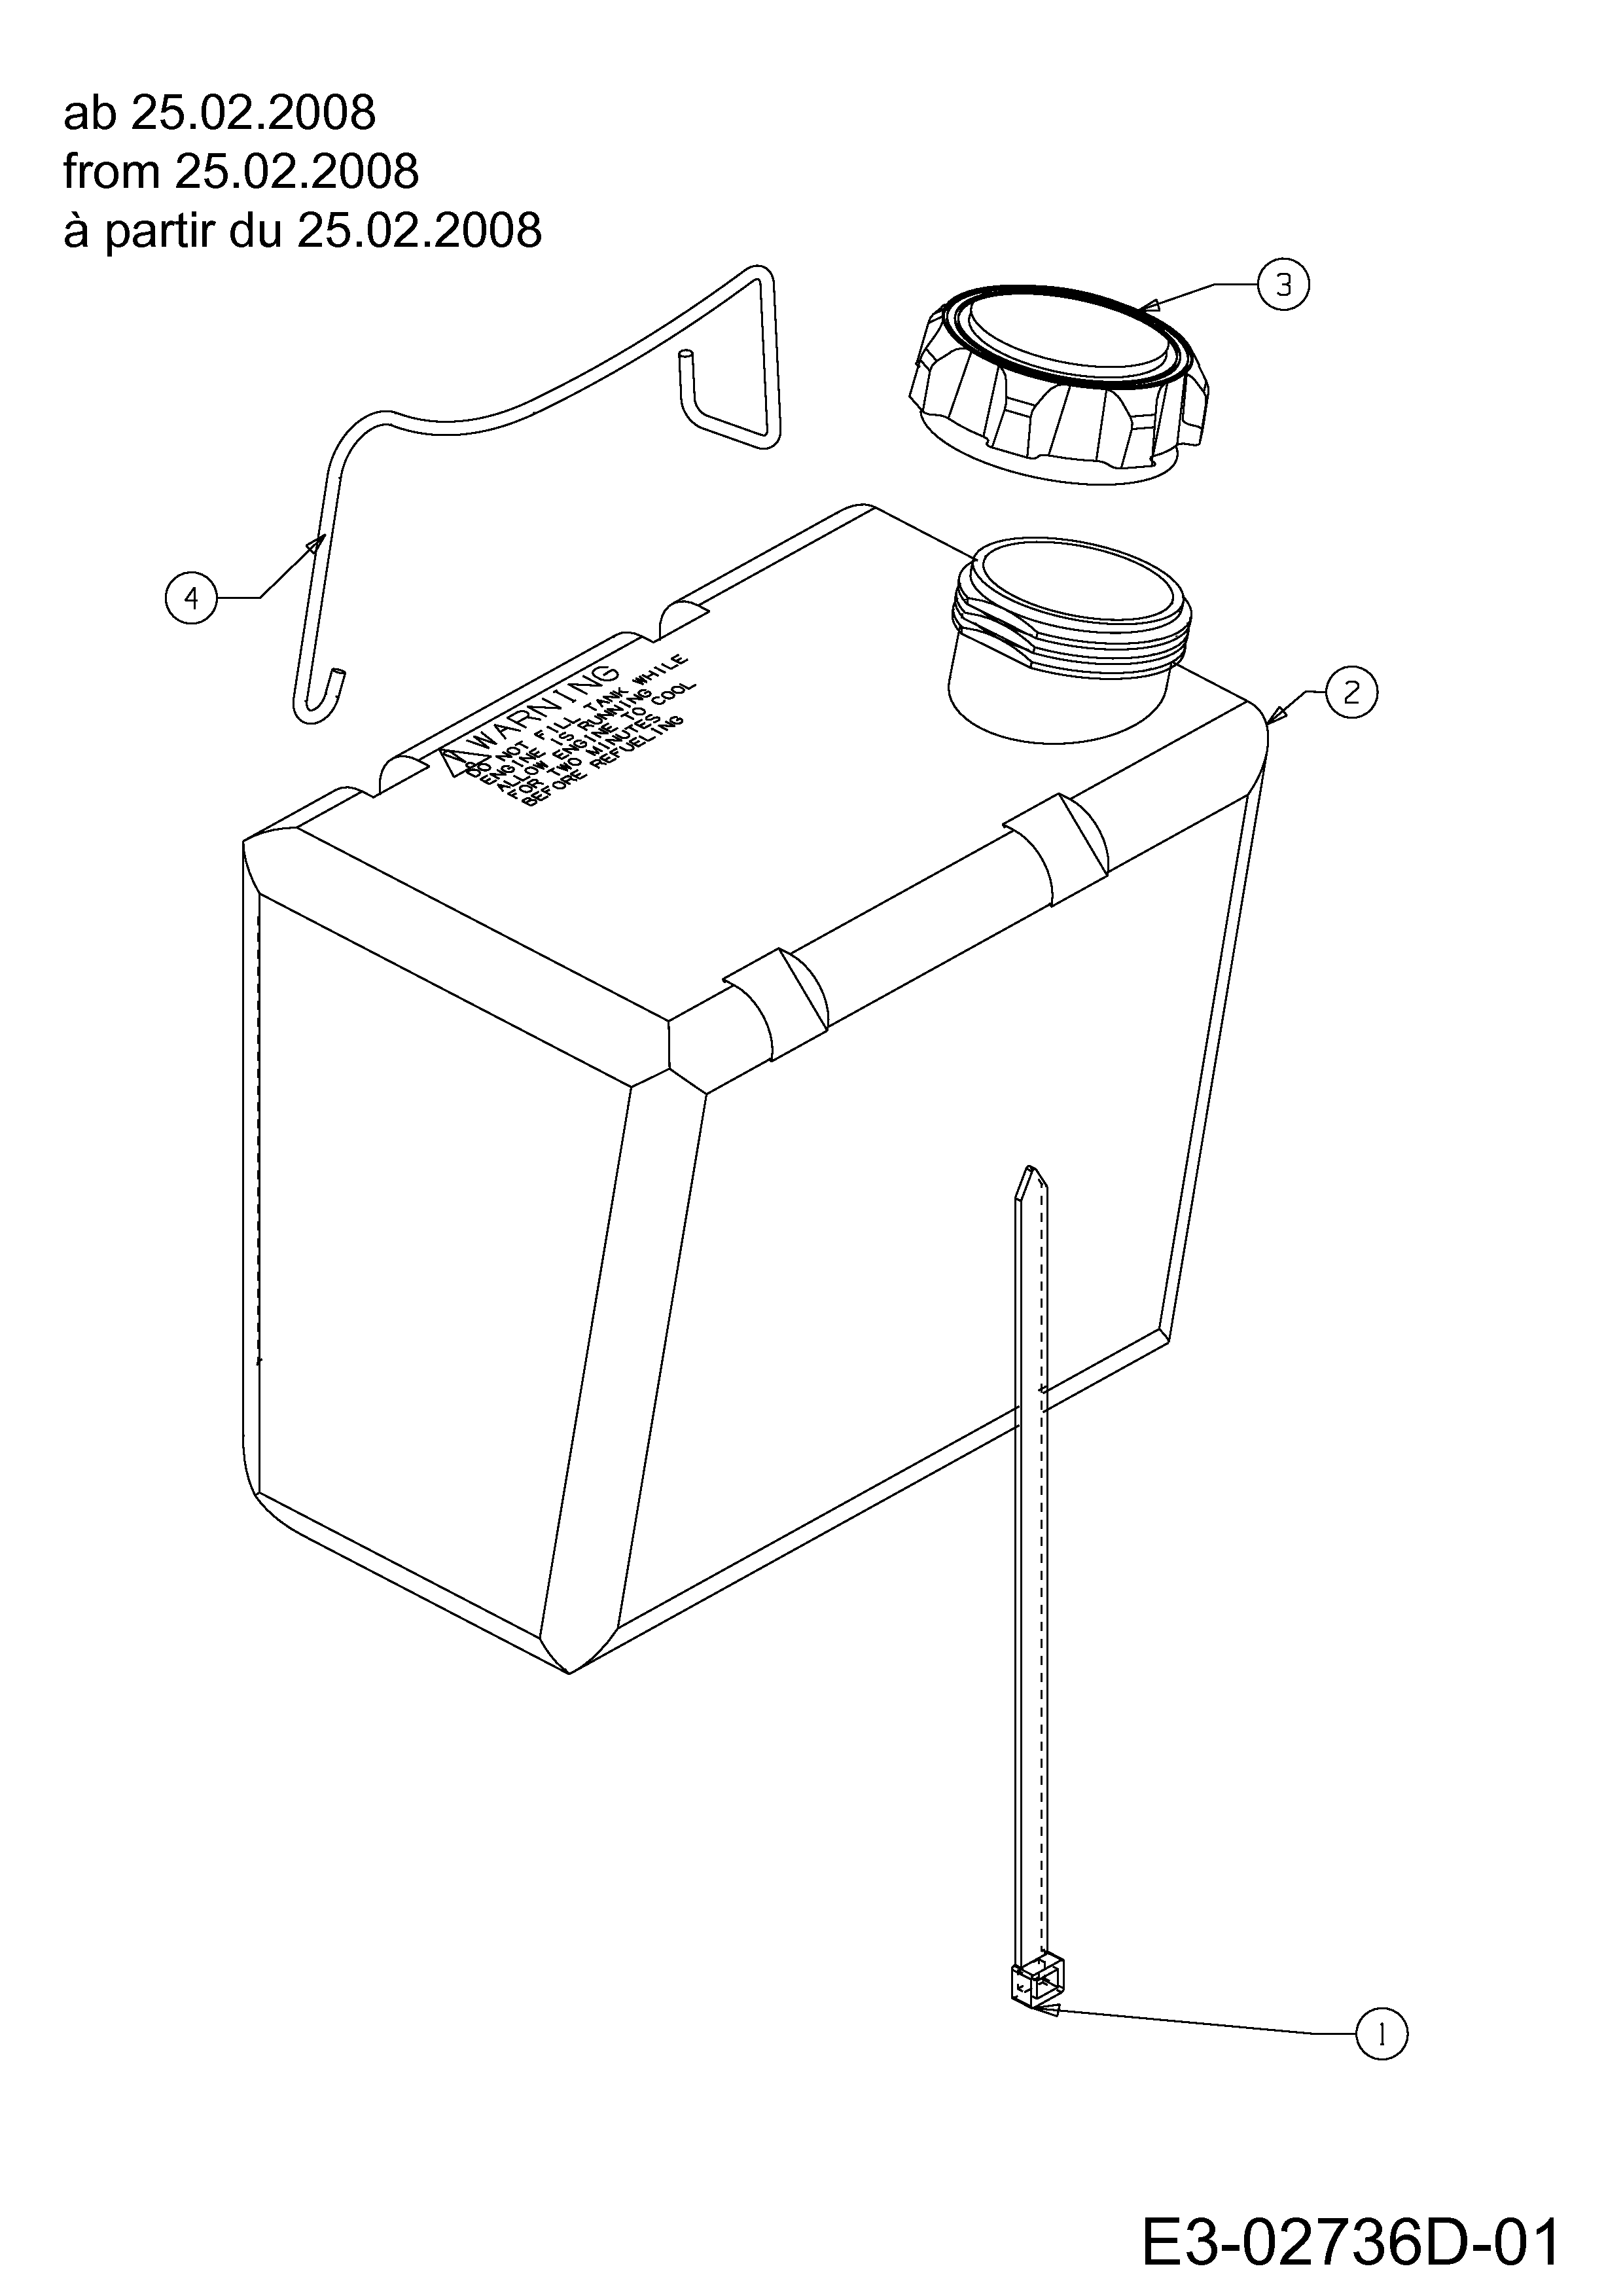 batteriehalter tank ab 13sh761e659 2009. Black Bedroom Furniture Sets. Home Design Ideas